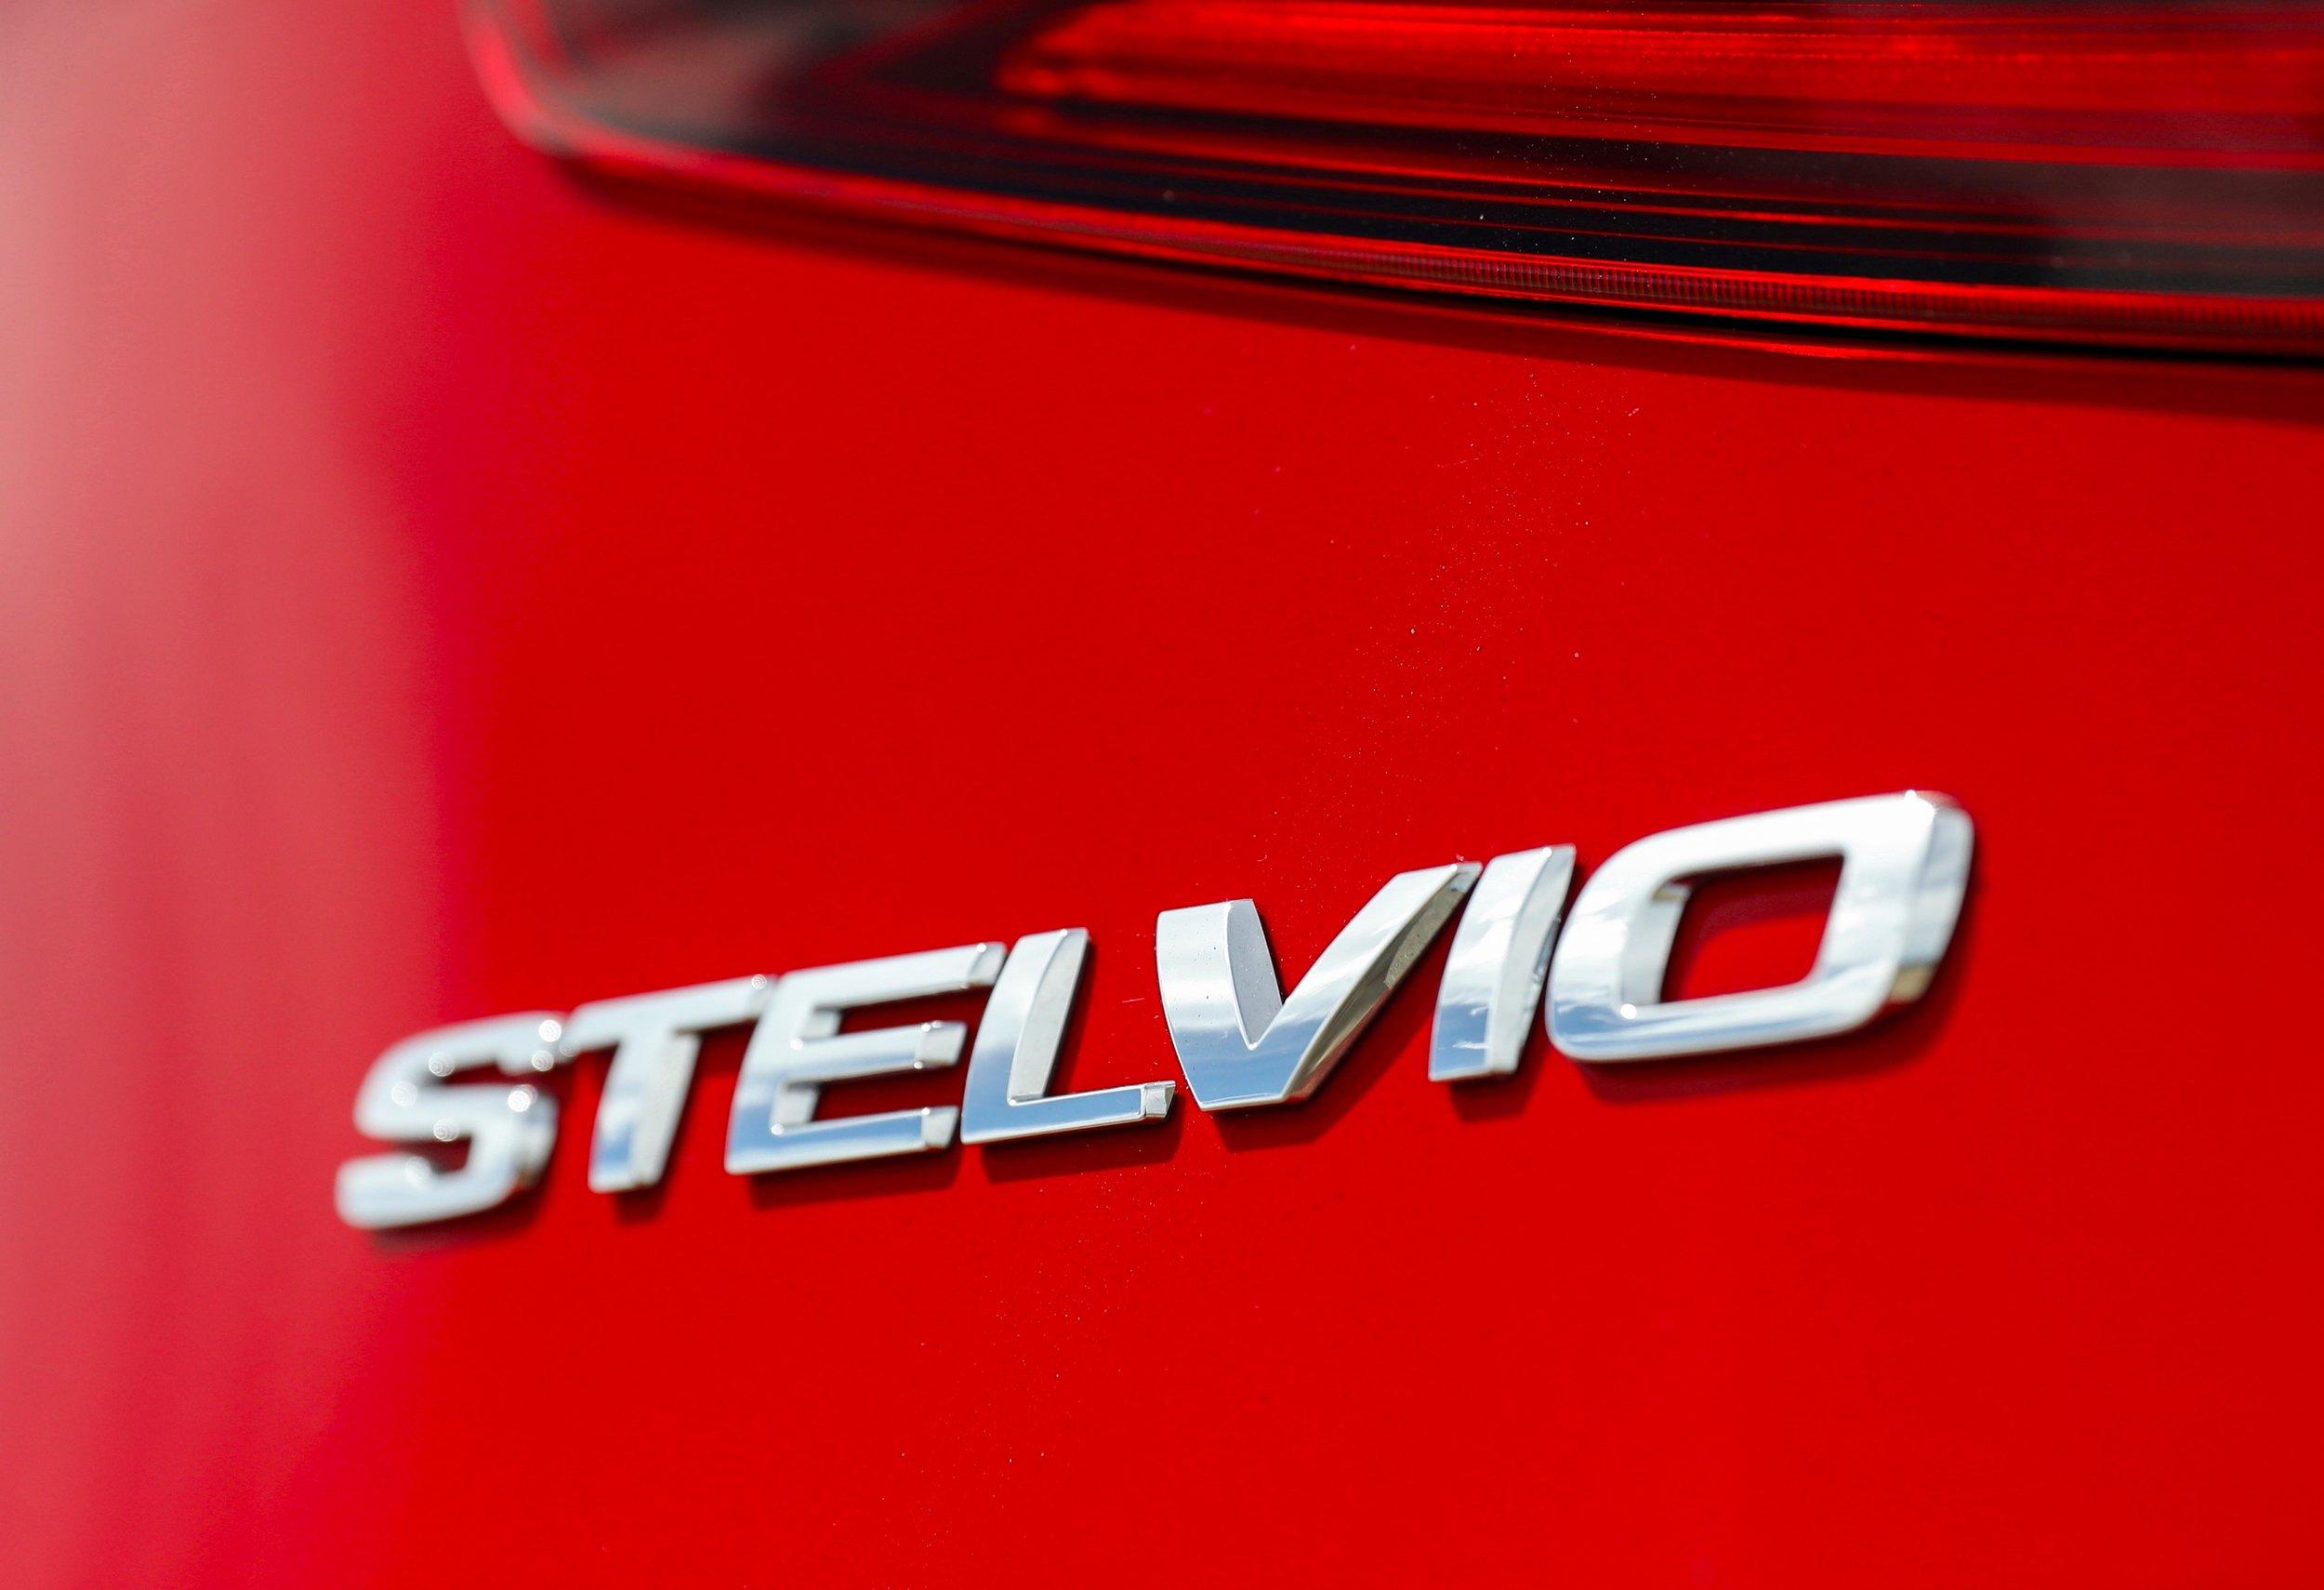 2018 Alfa Romeo Stelvio_Badge_0002.JPG